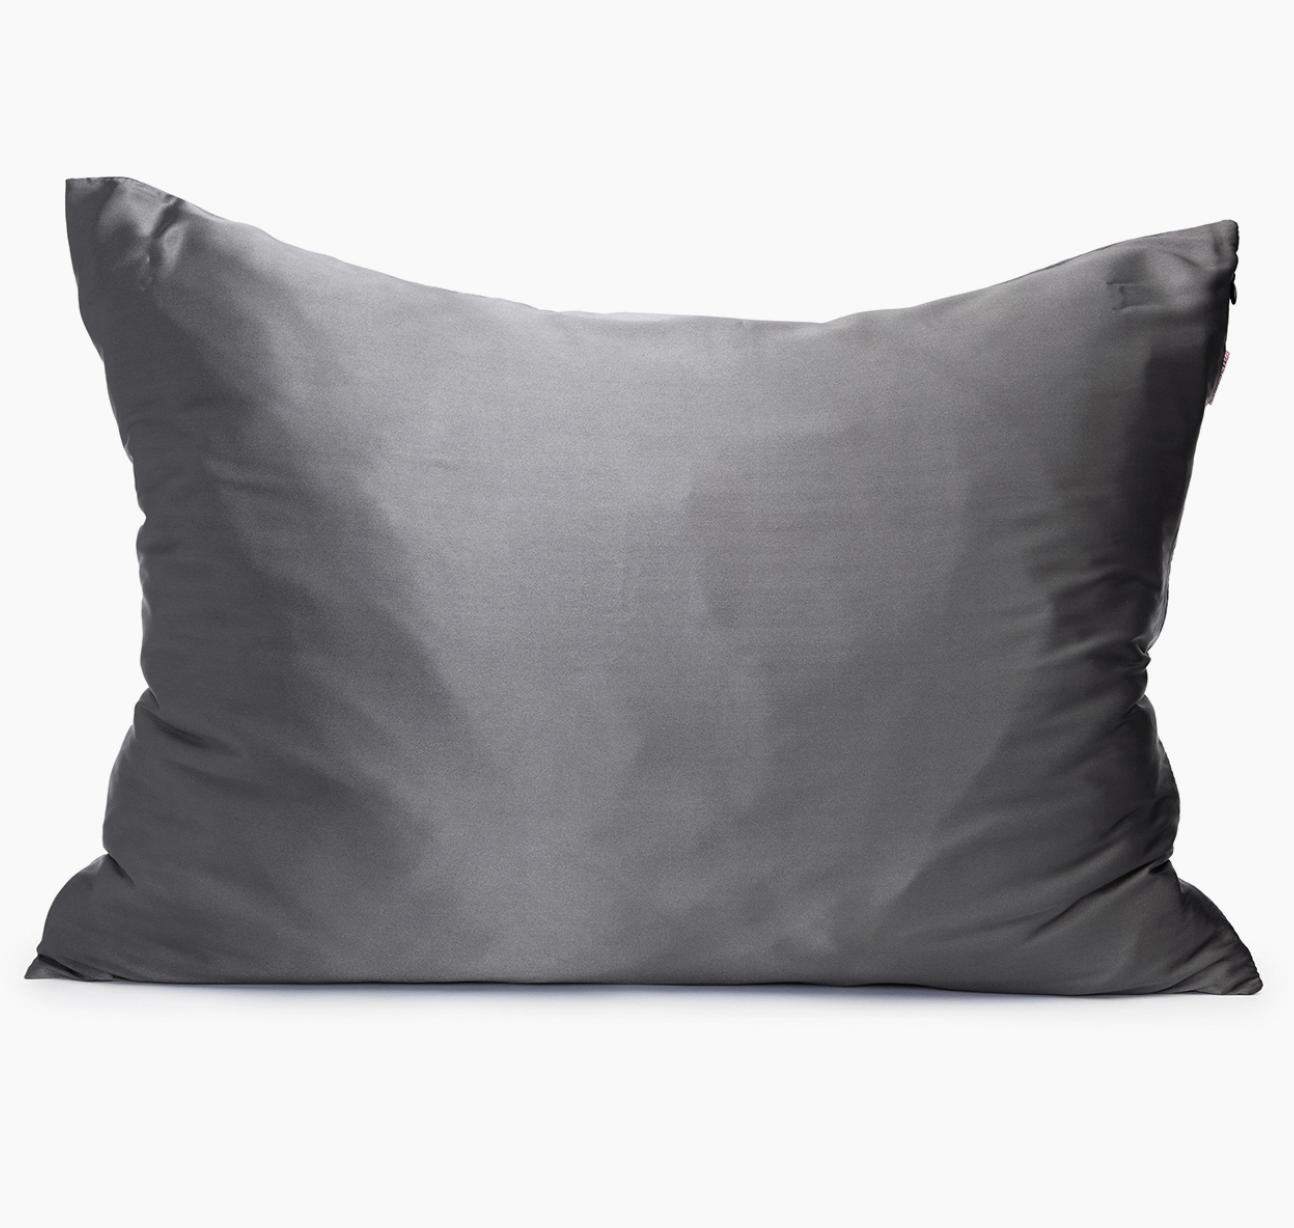 Kitsch Satin Pillowcase - Charcoal